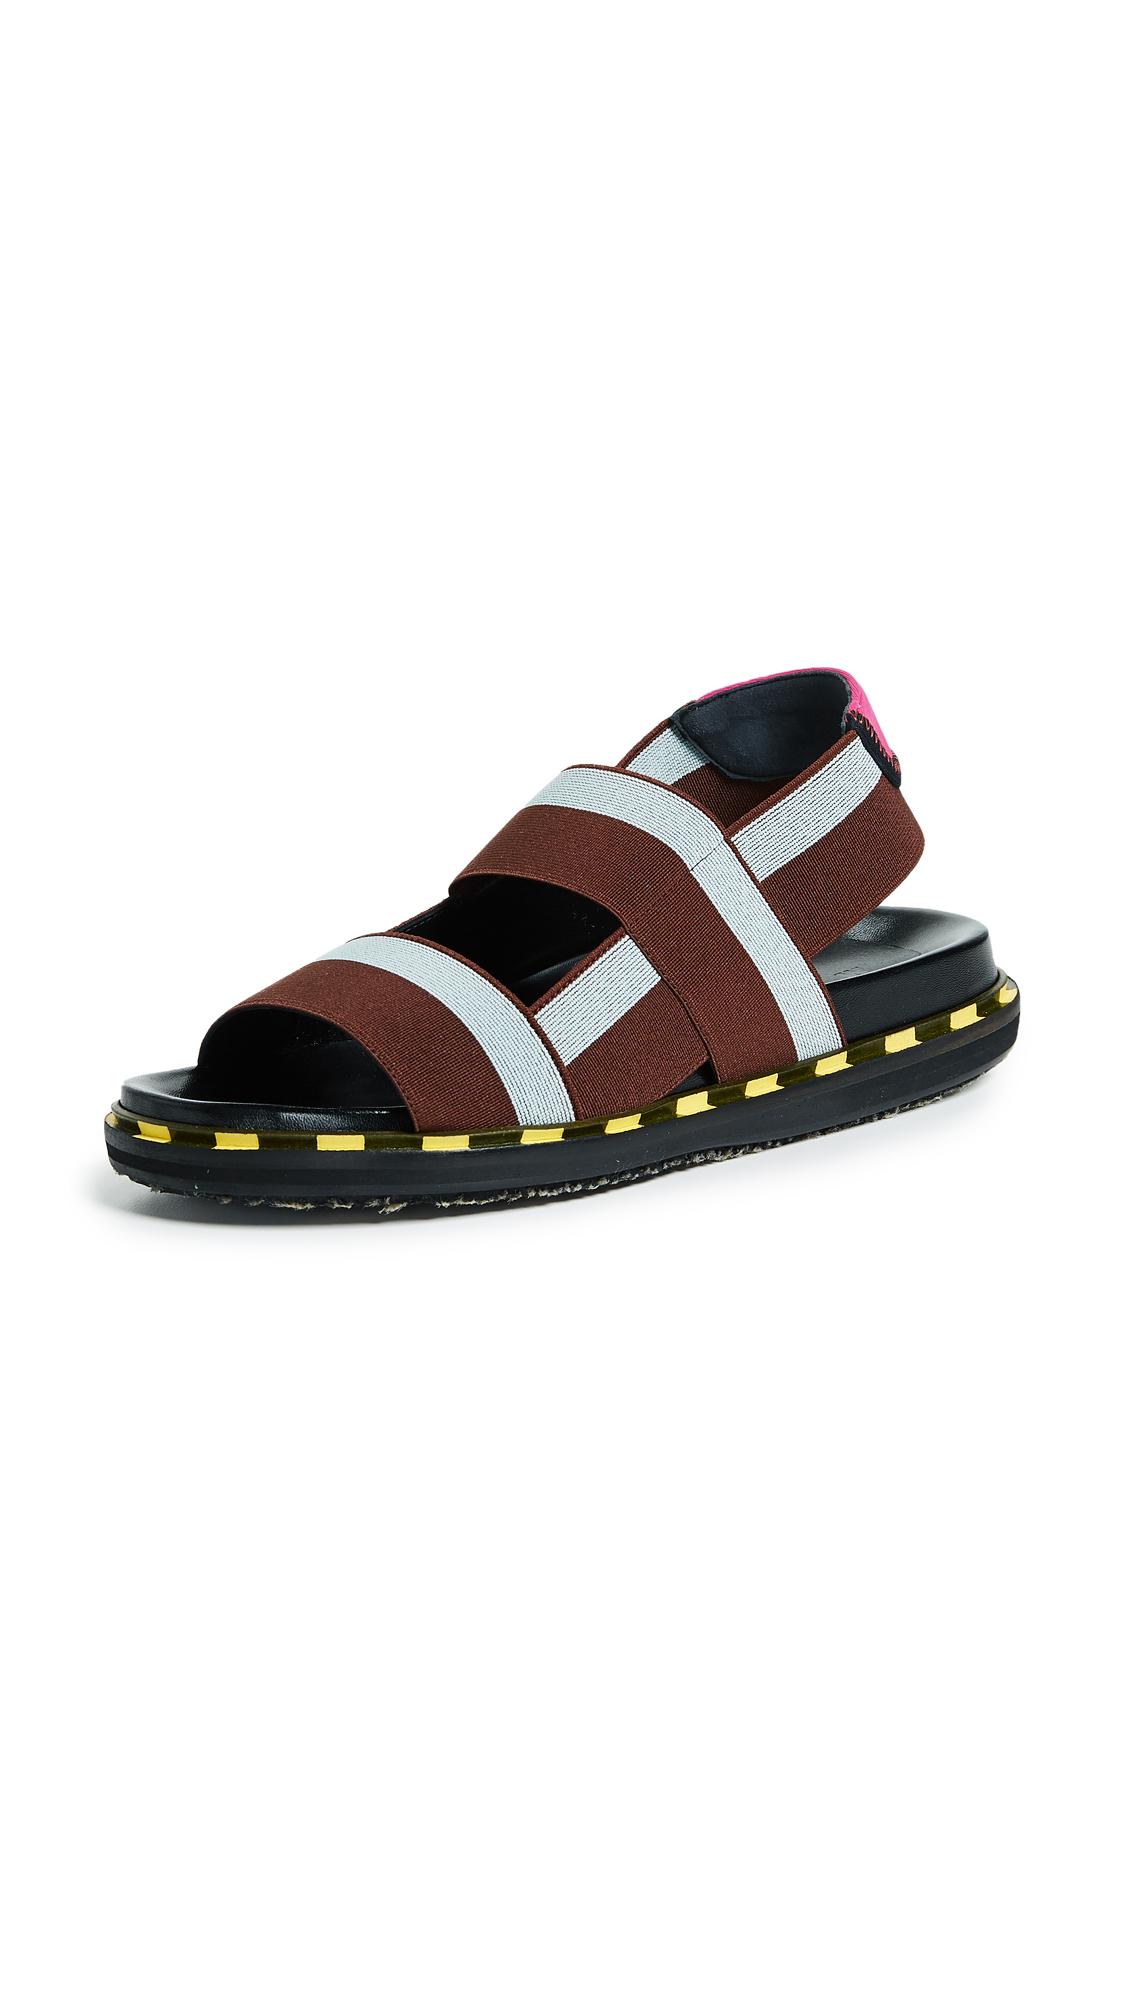 Marni Fussbett Sandals - Aquamarine/Brandy